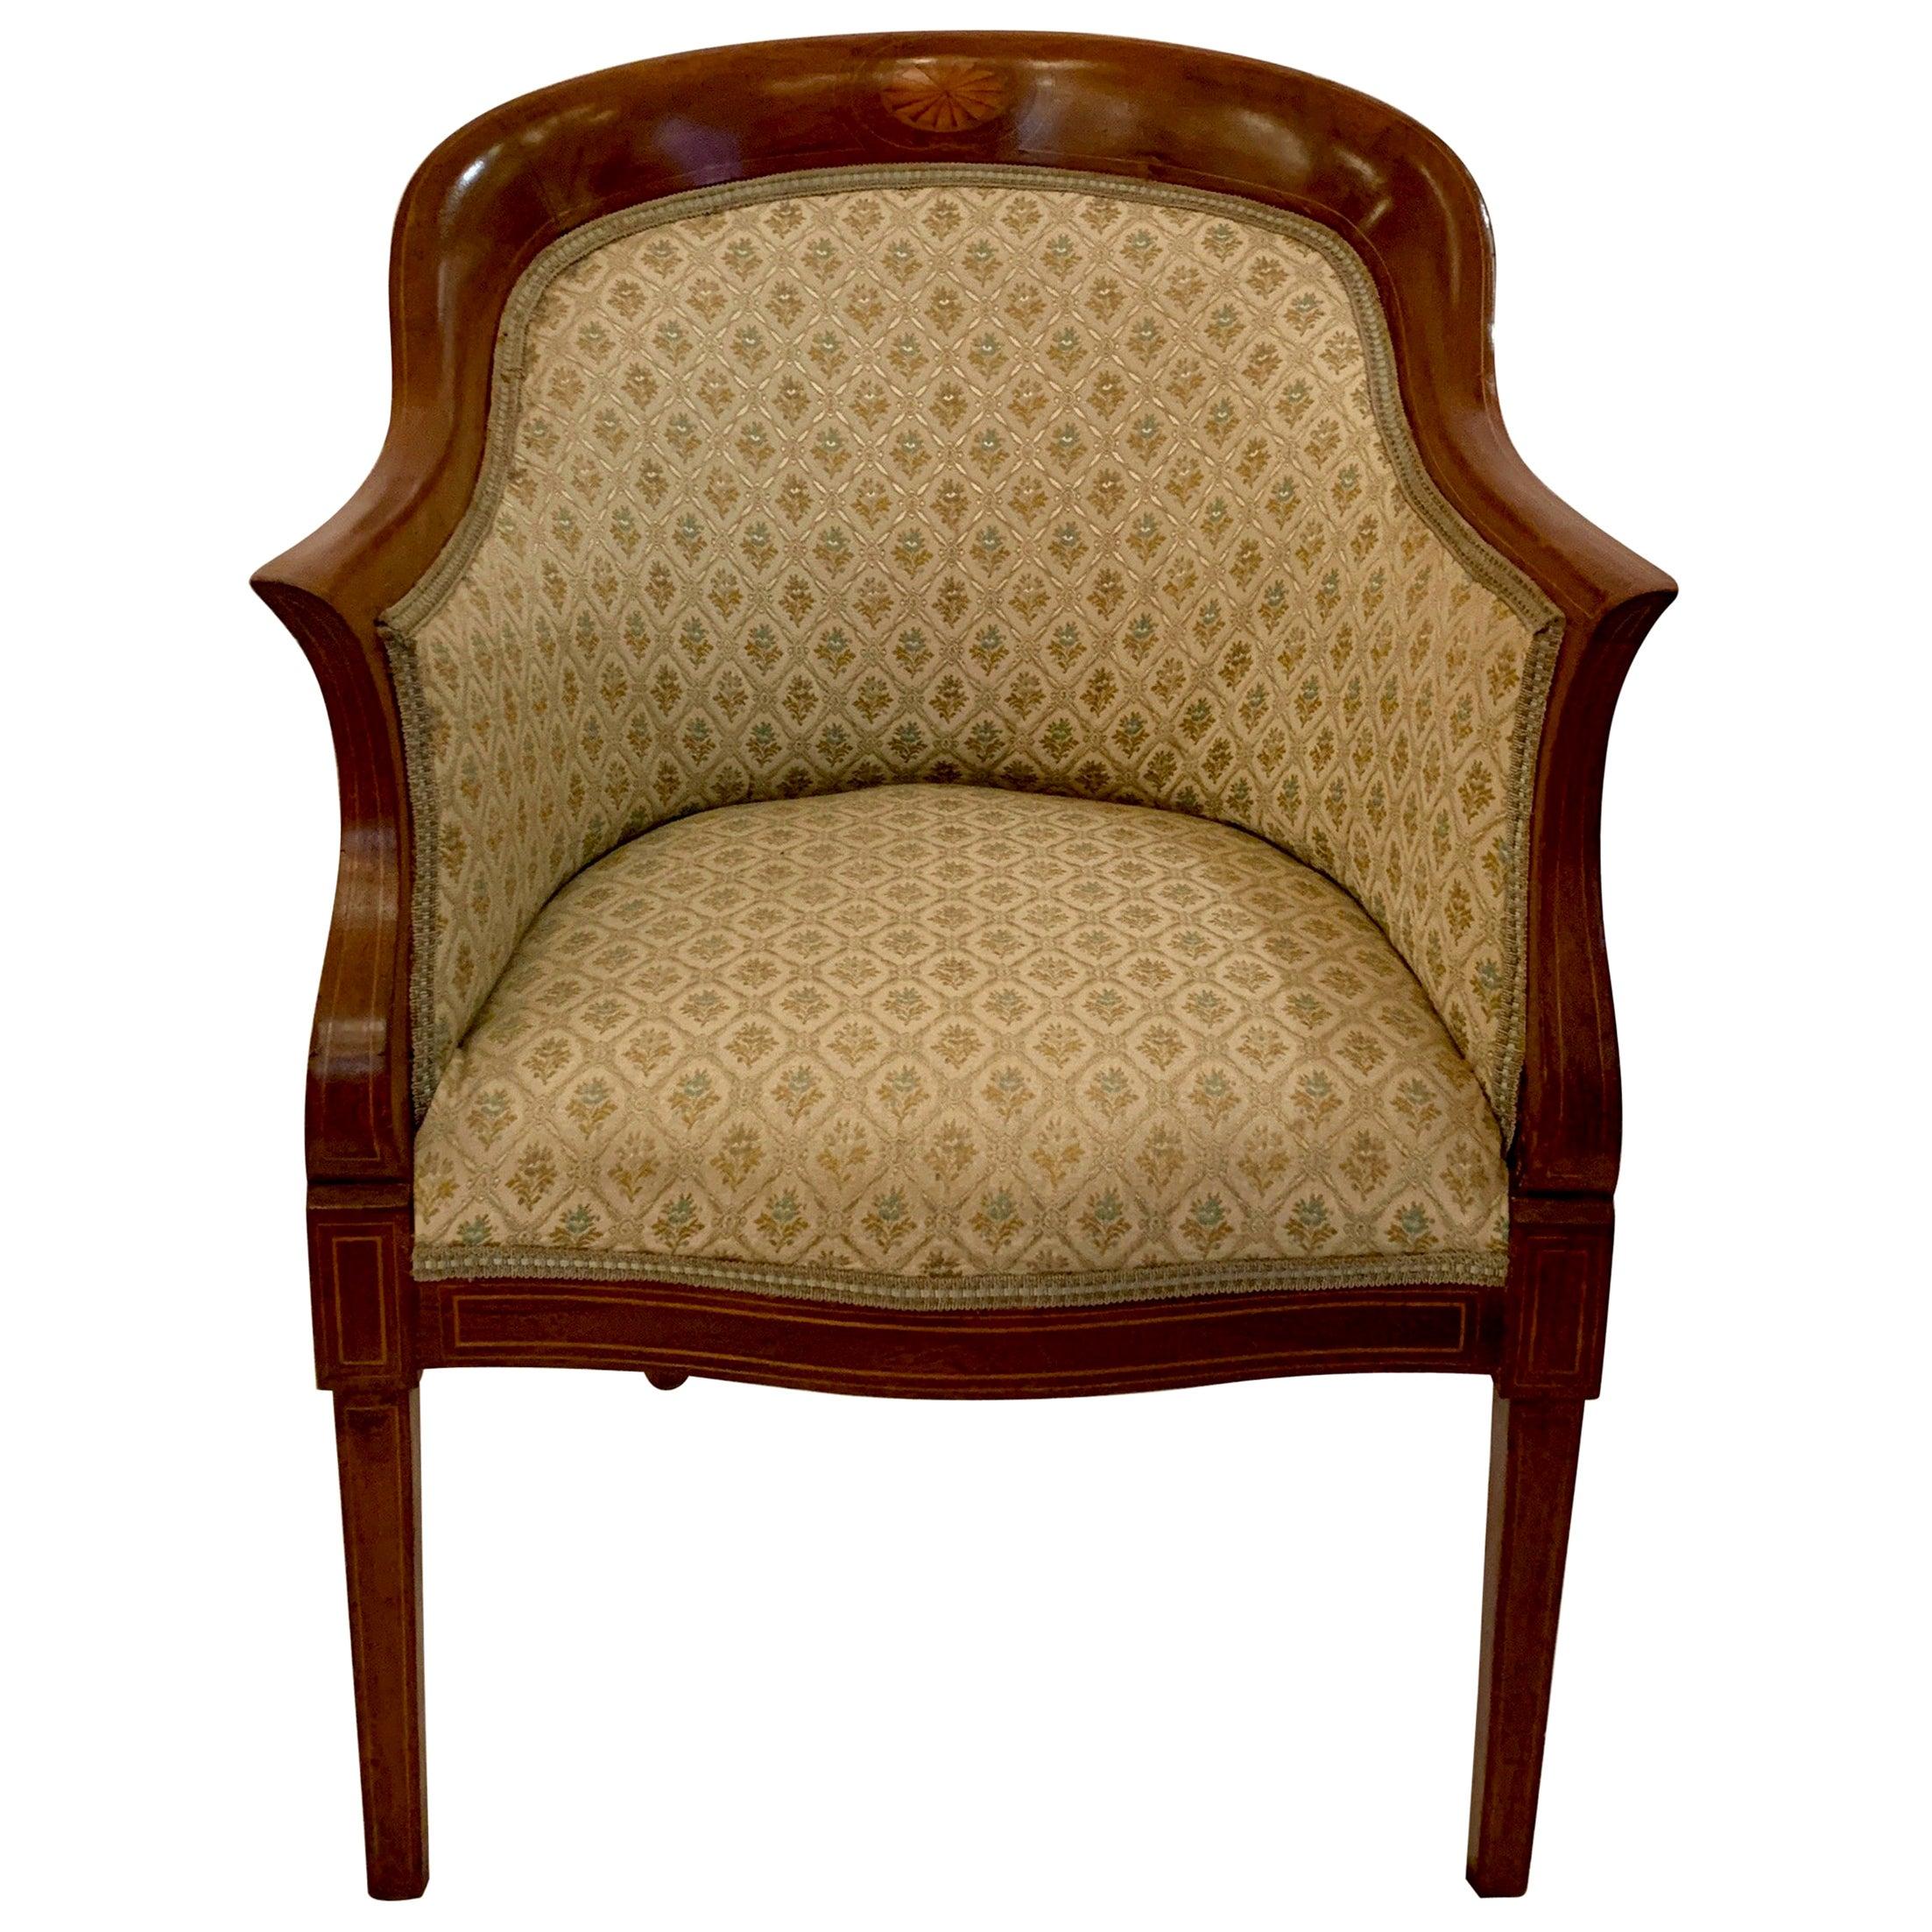 Antique English Edwardian Mahogany Tub Chair 'Armchair', circa 1900-1910